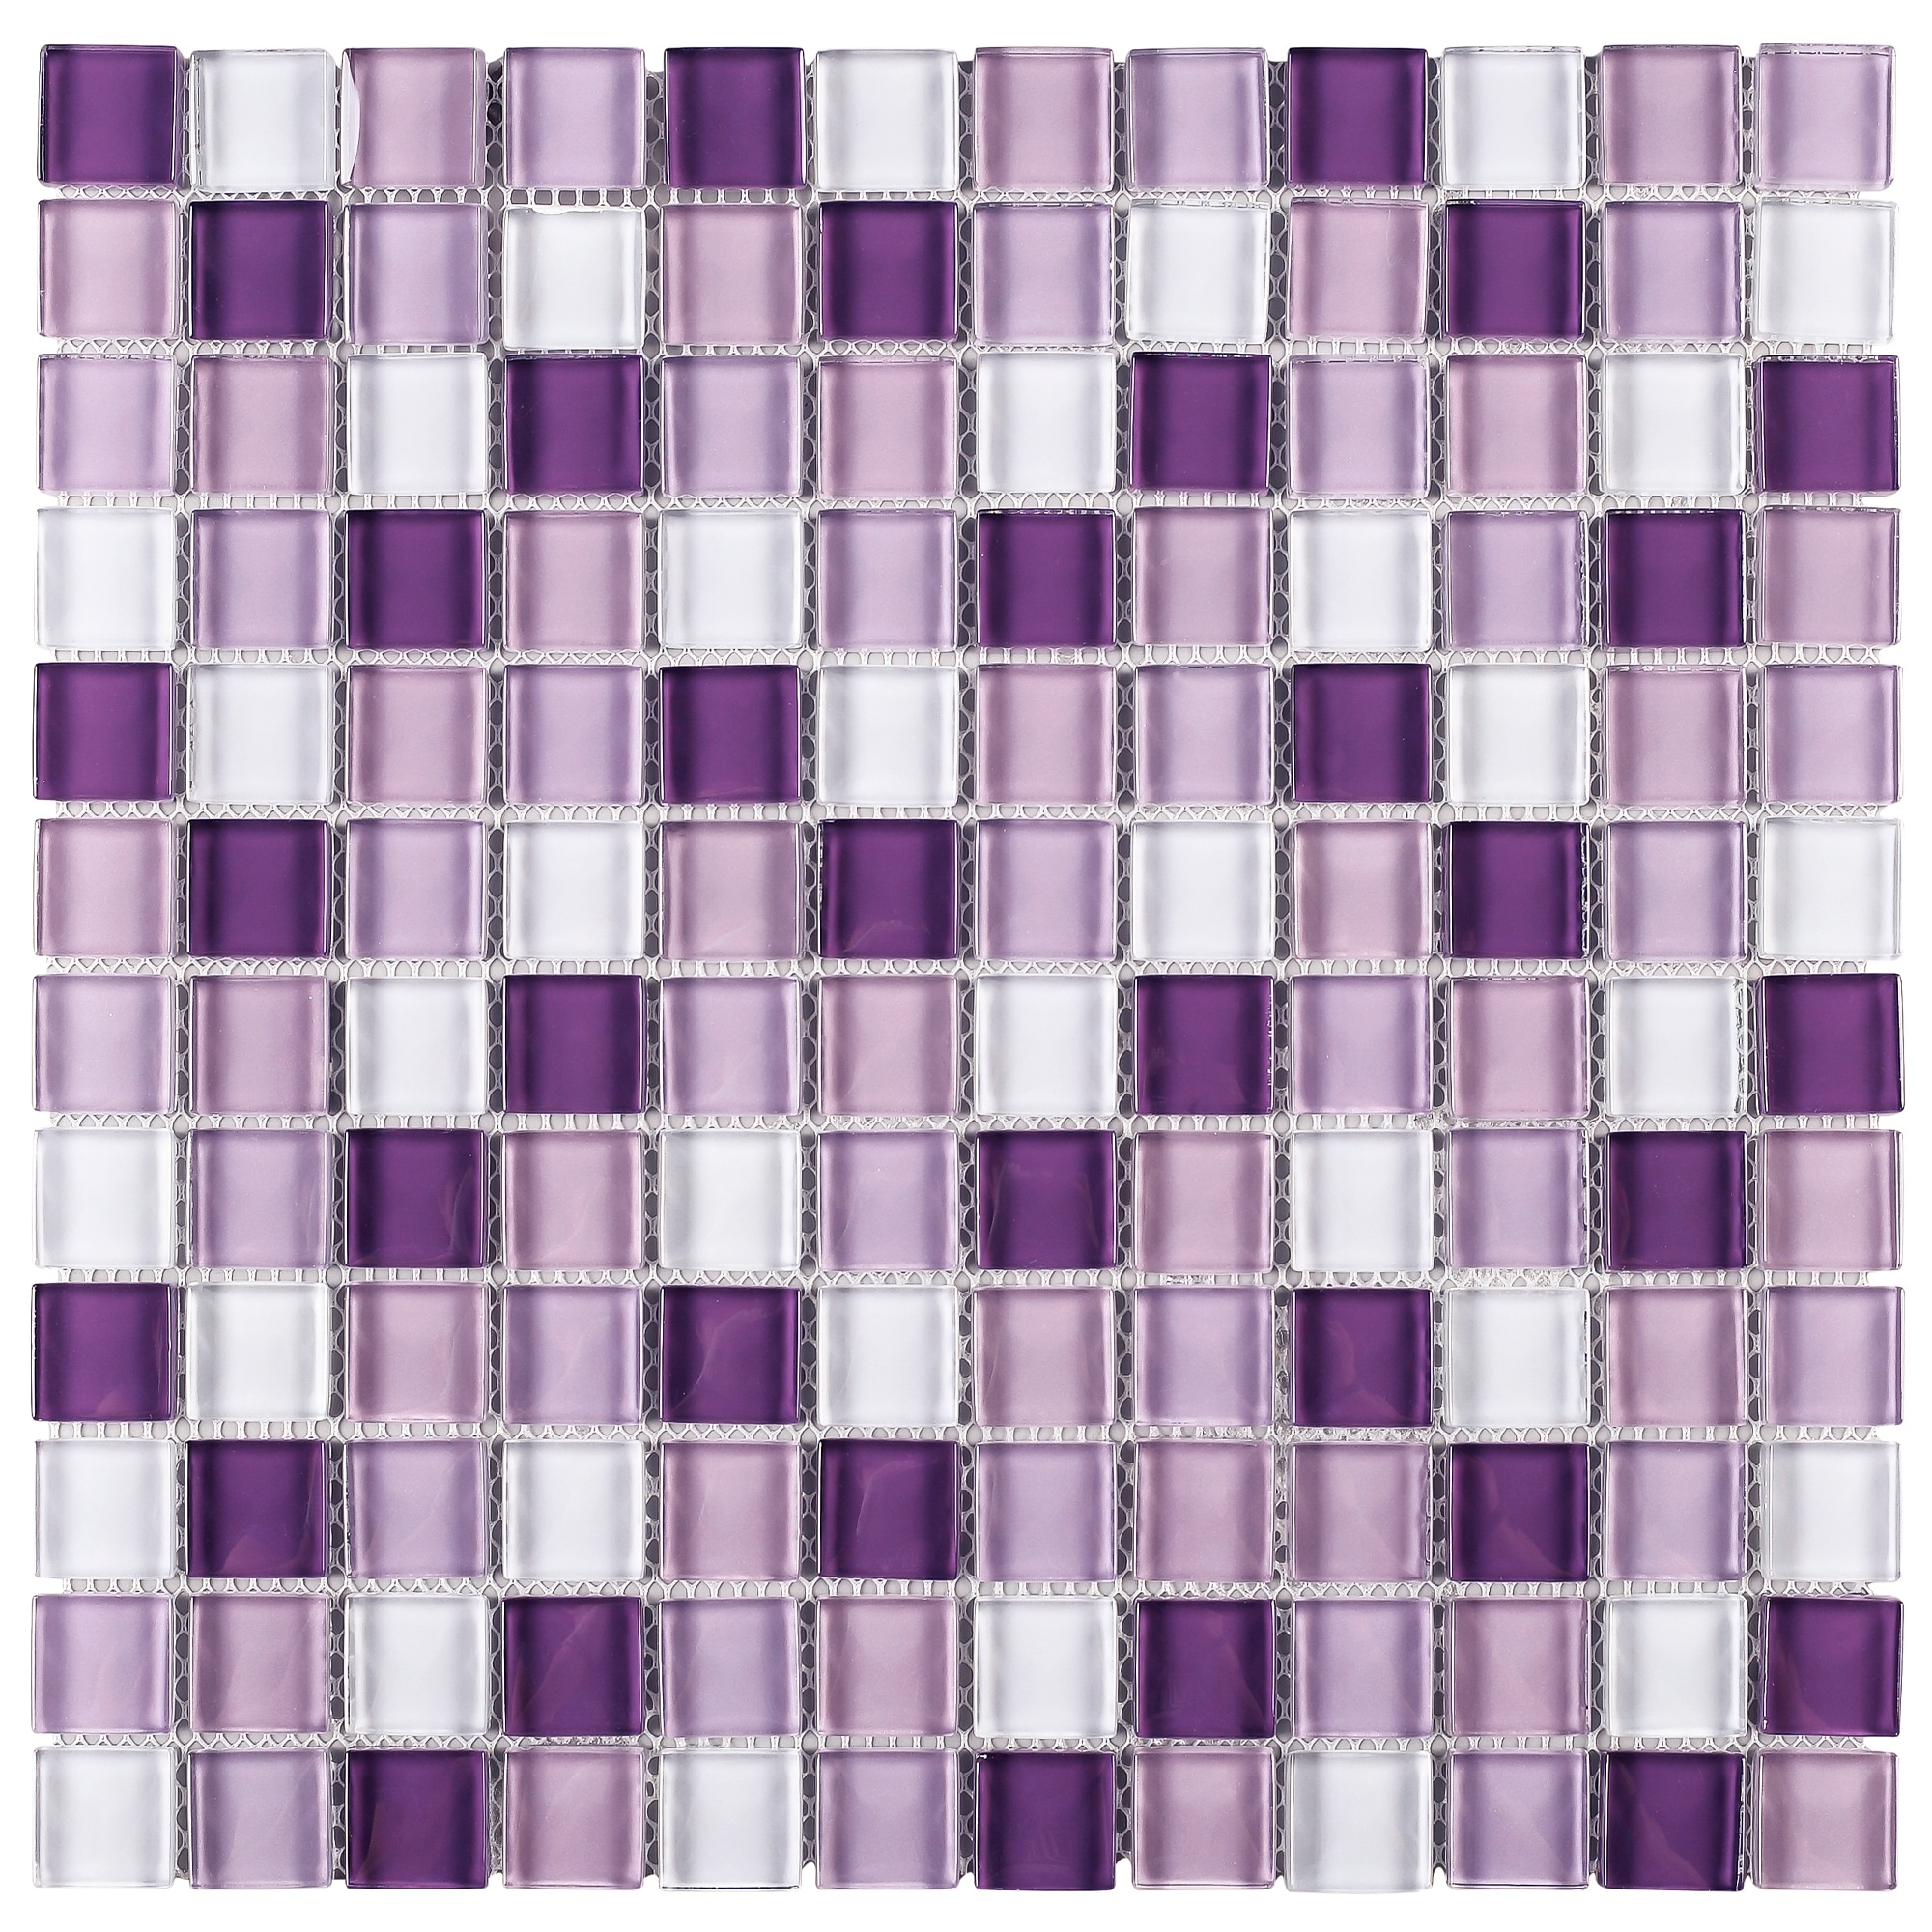 tilegen grid 1 x 1 glass mosaic tile in mix purple wall tile 10 sheets 9 6sqft